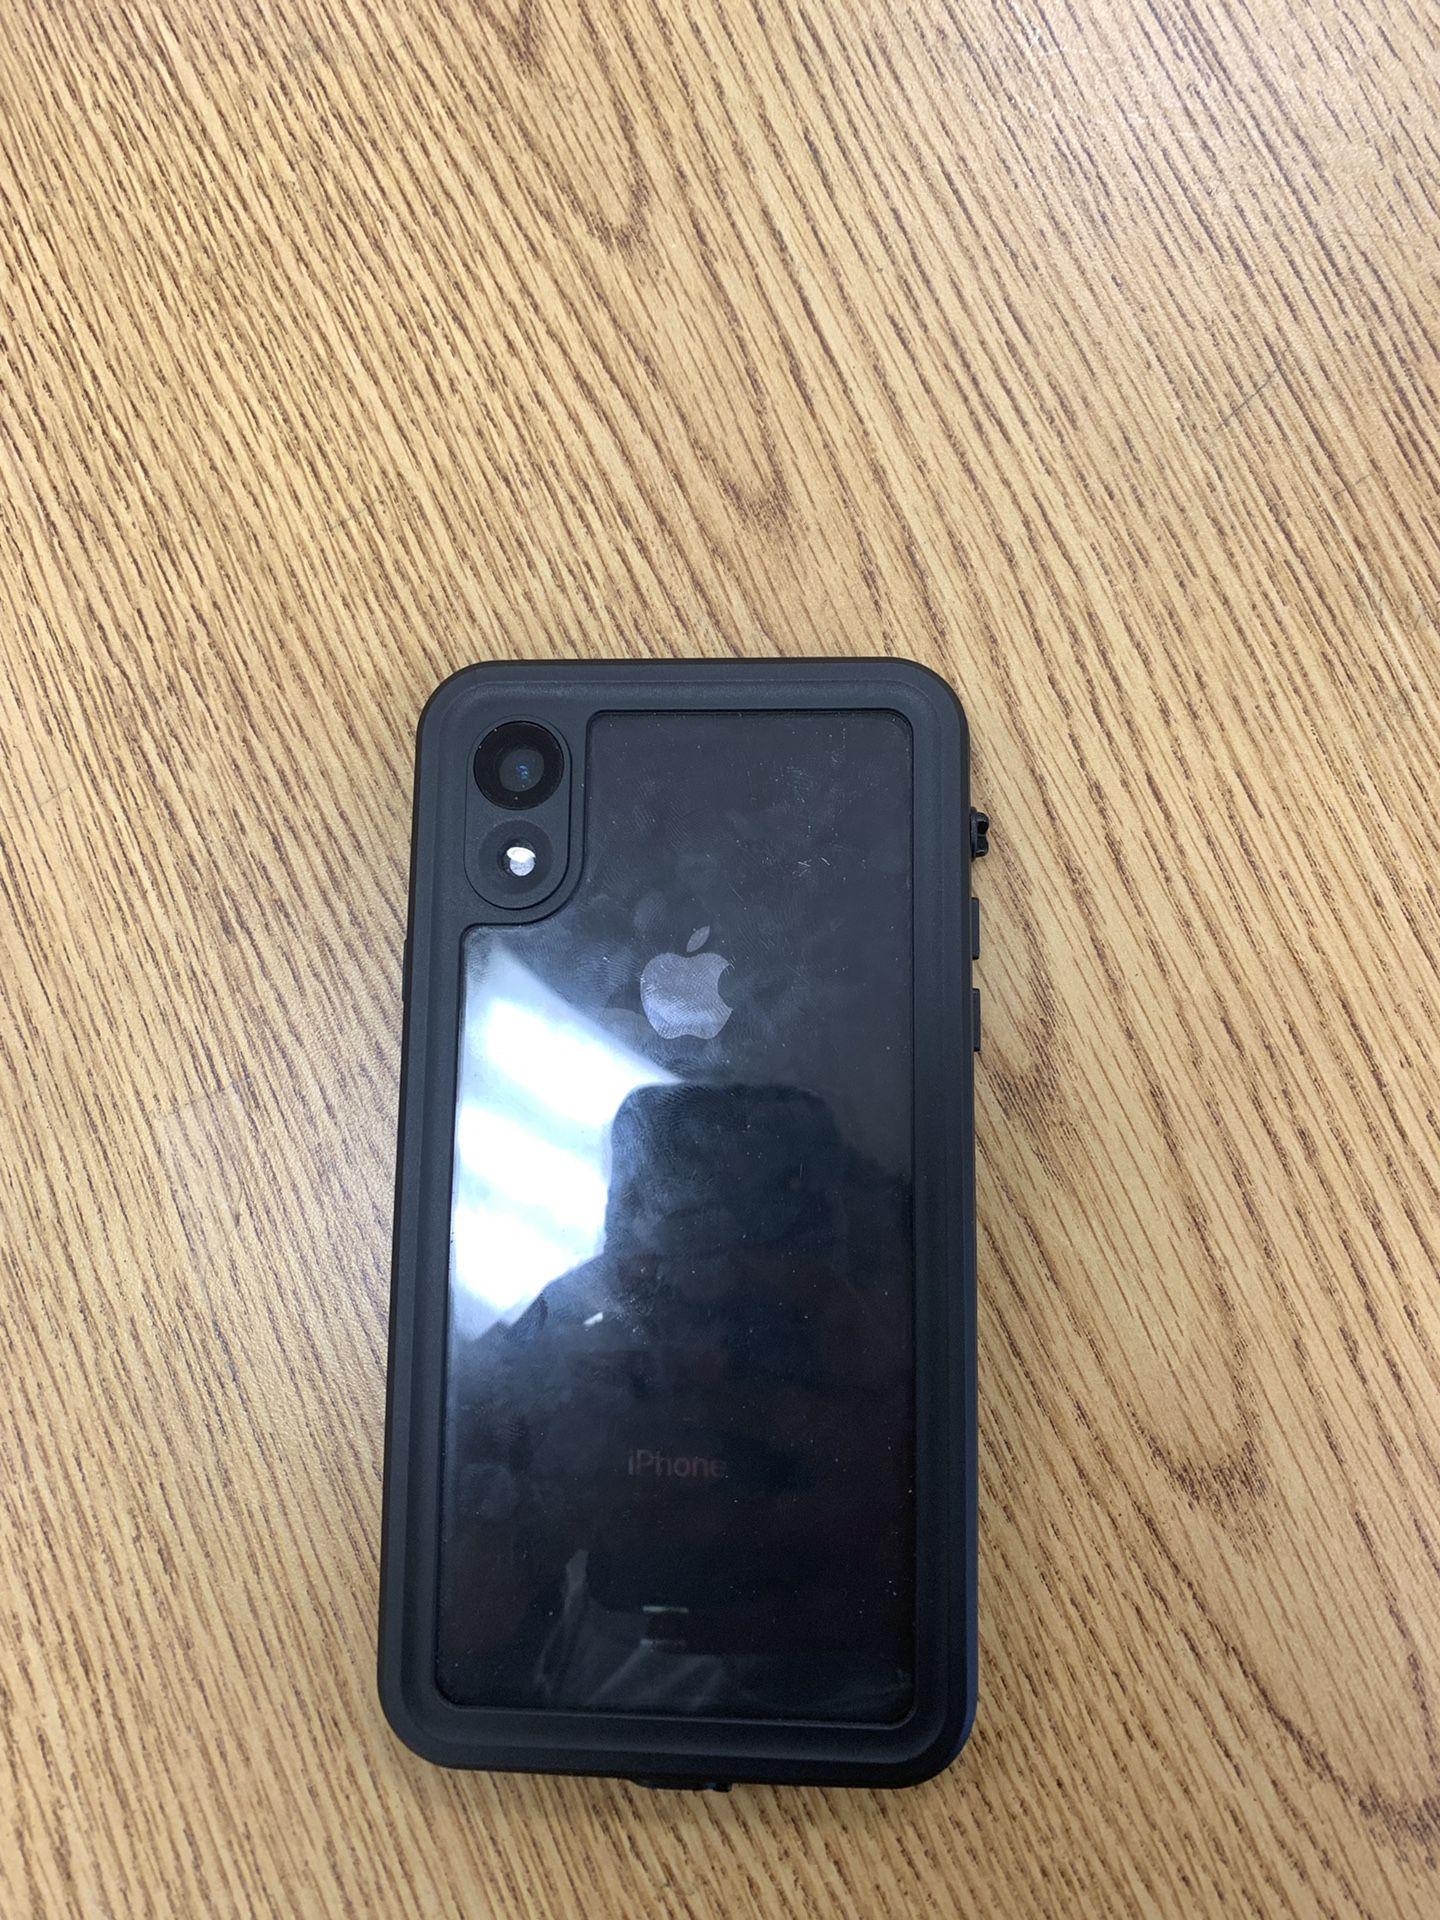 iPhone XR black